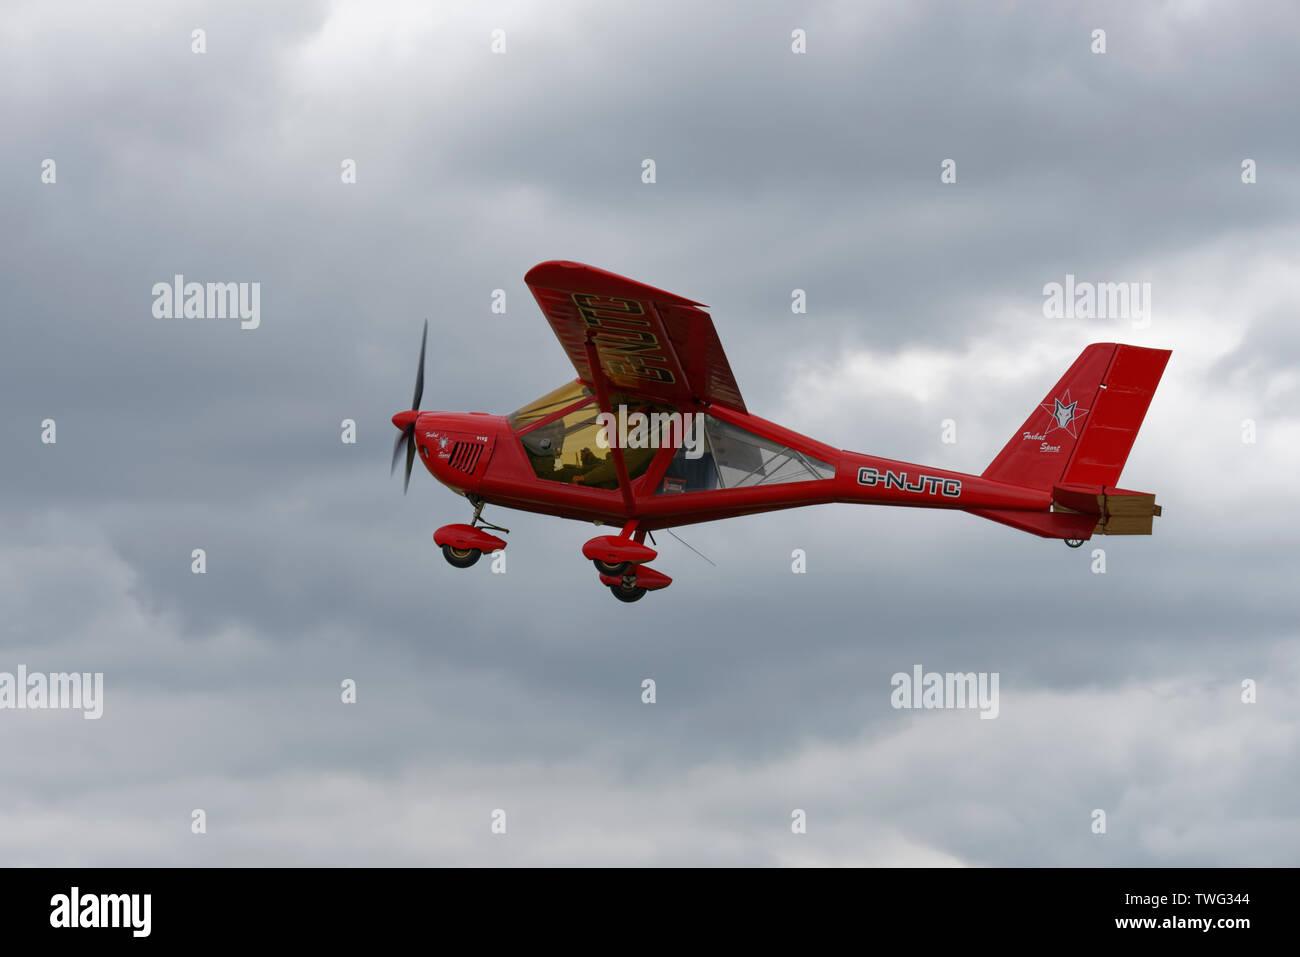 Ultralight Aircraft Stock Photos & Ultralight Aircraft Stock